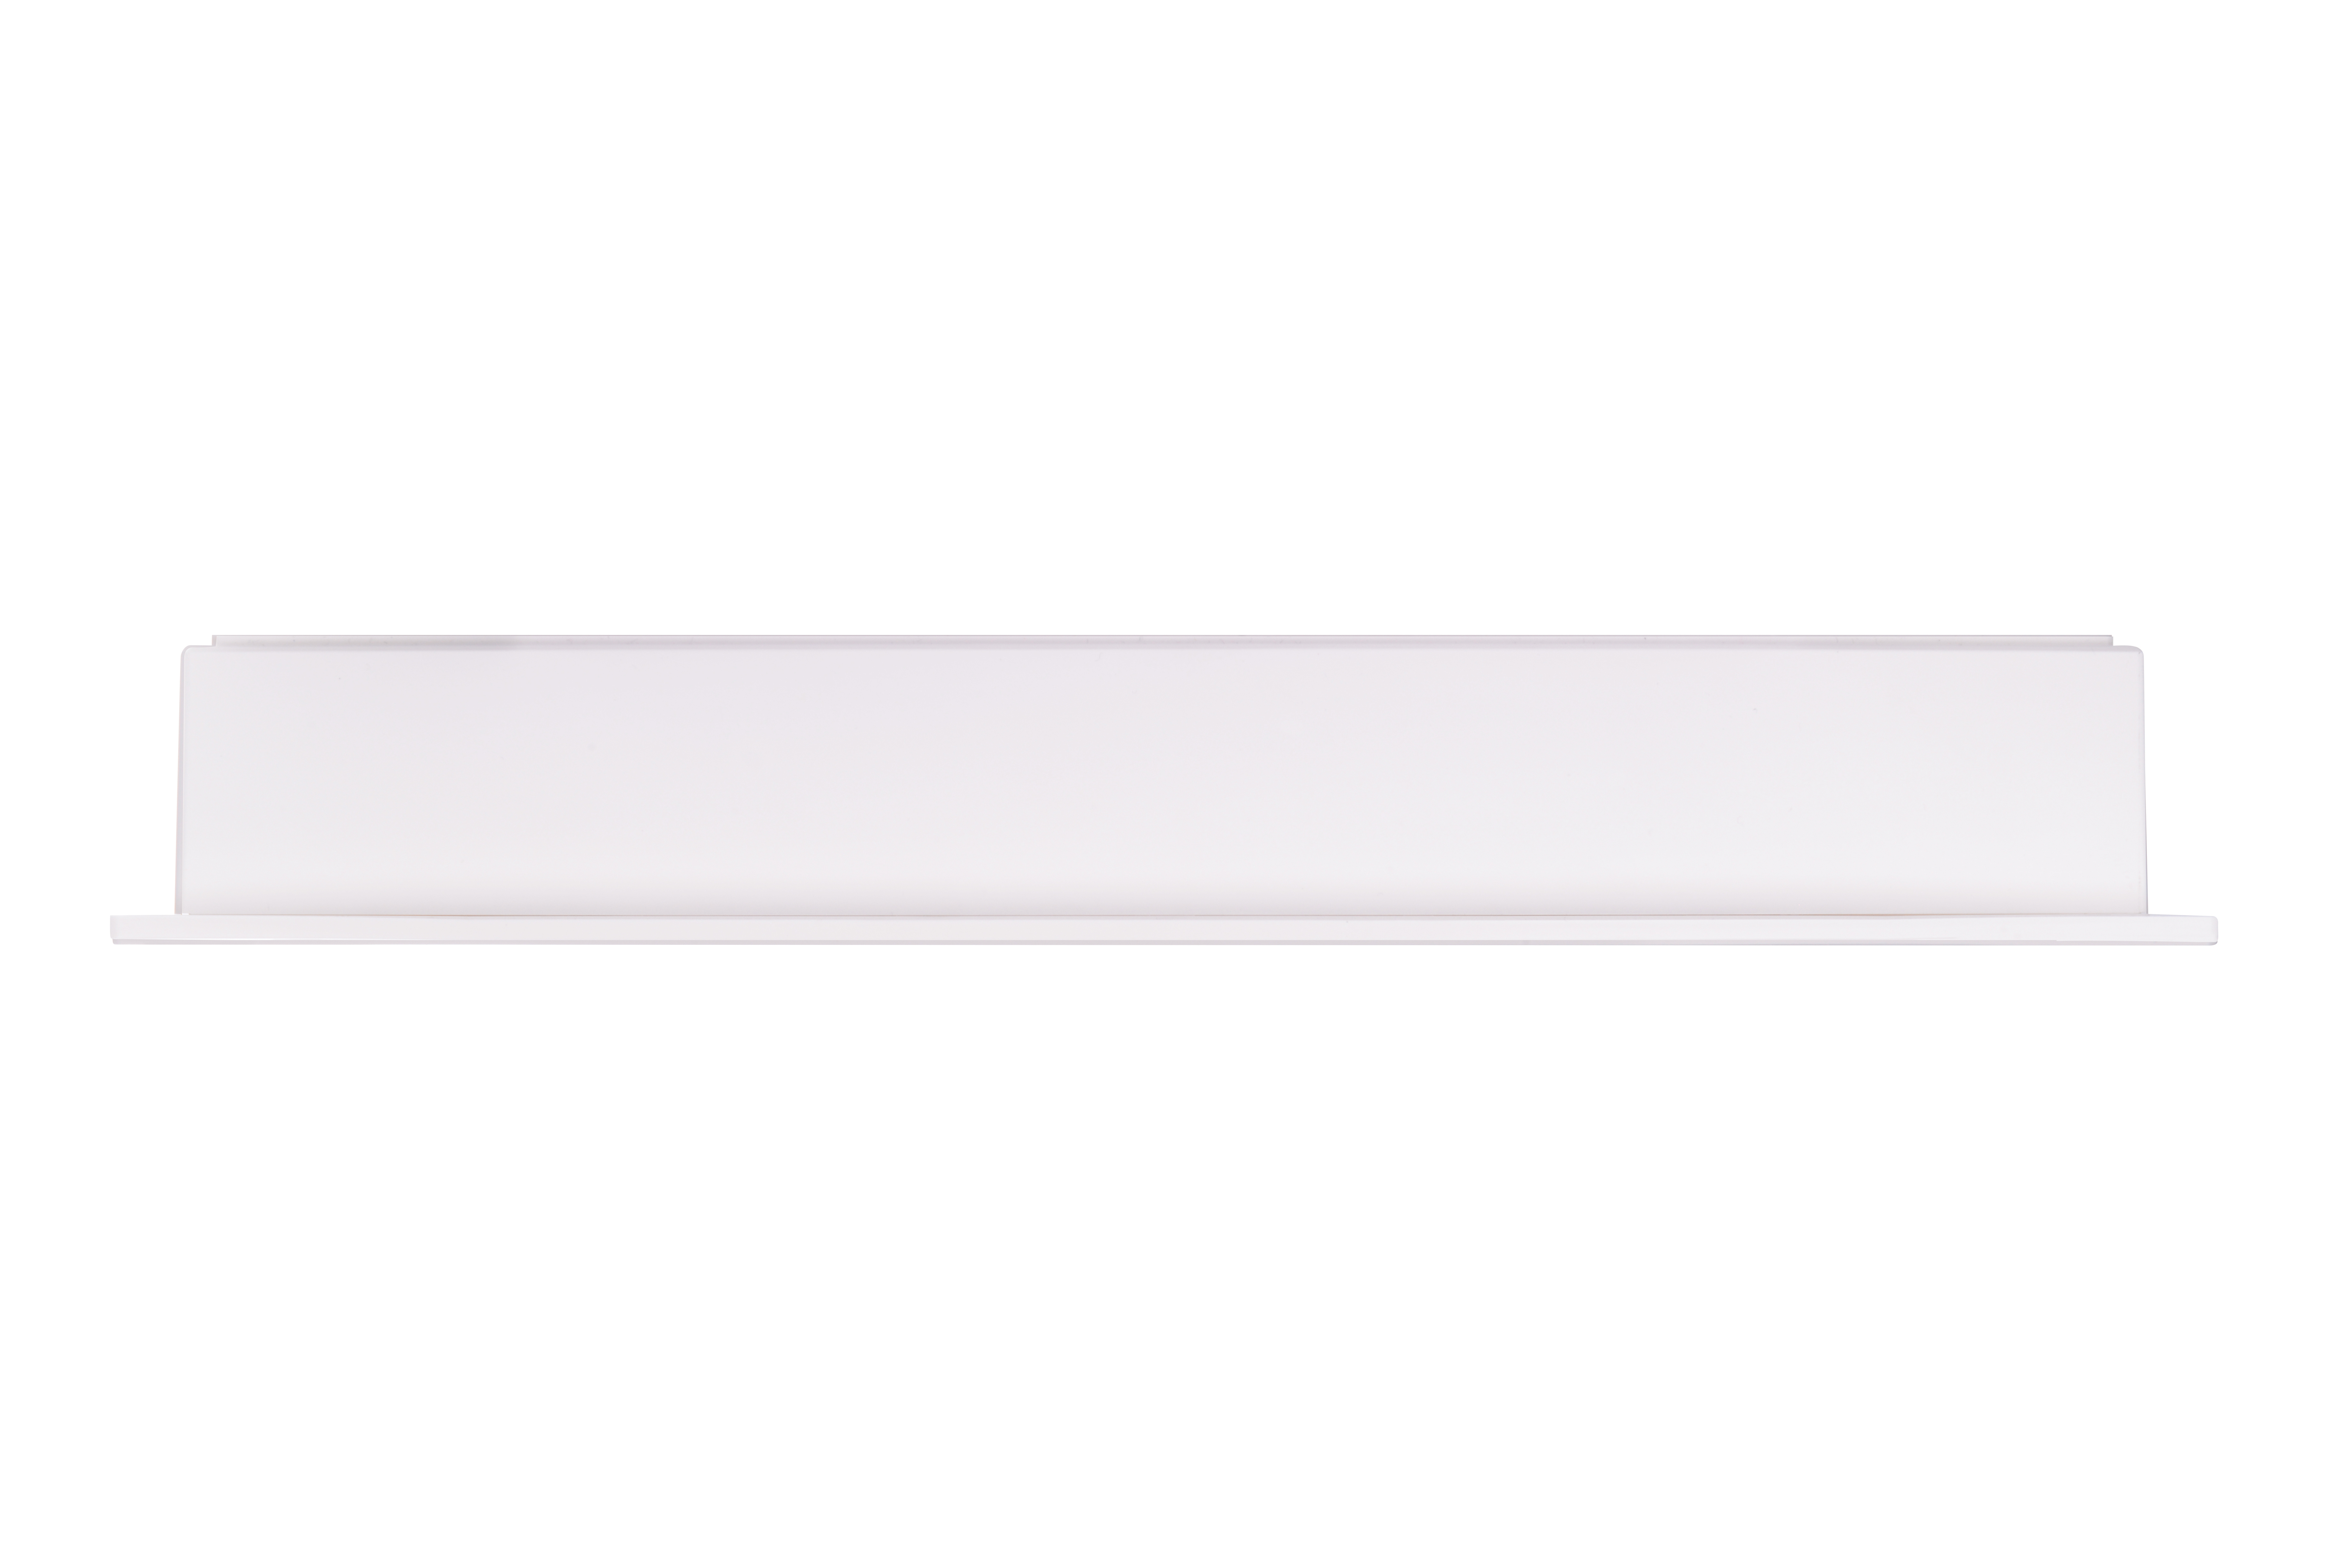 Lampa antipanica led Intelight 94571   3h mentinut test automat 5